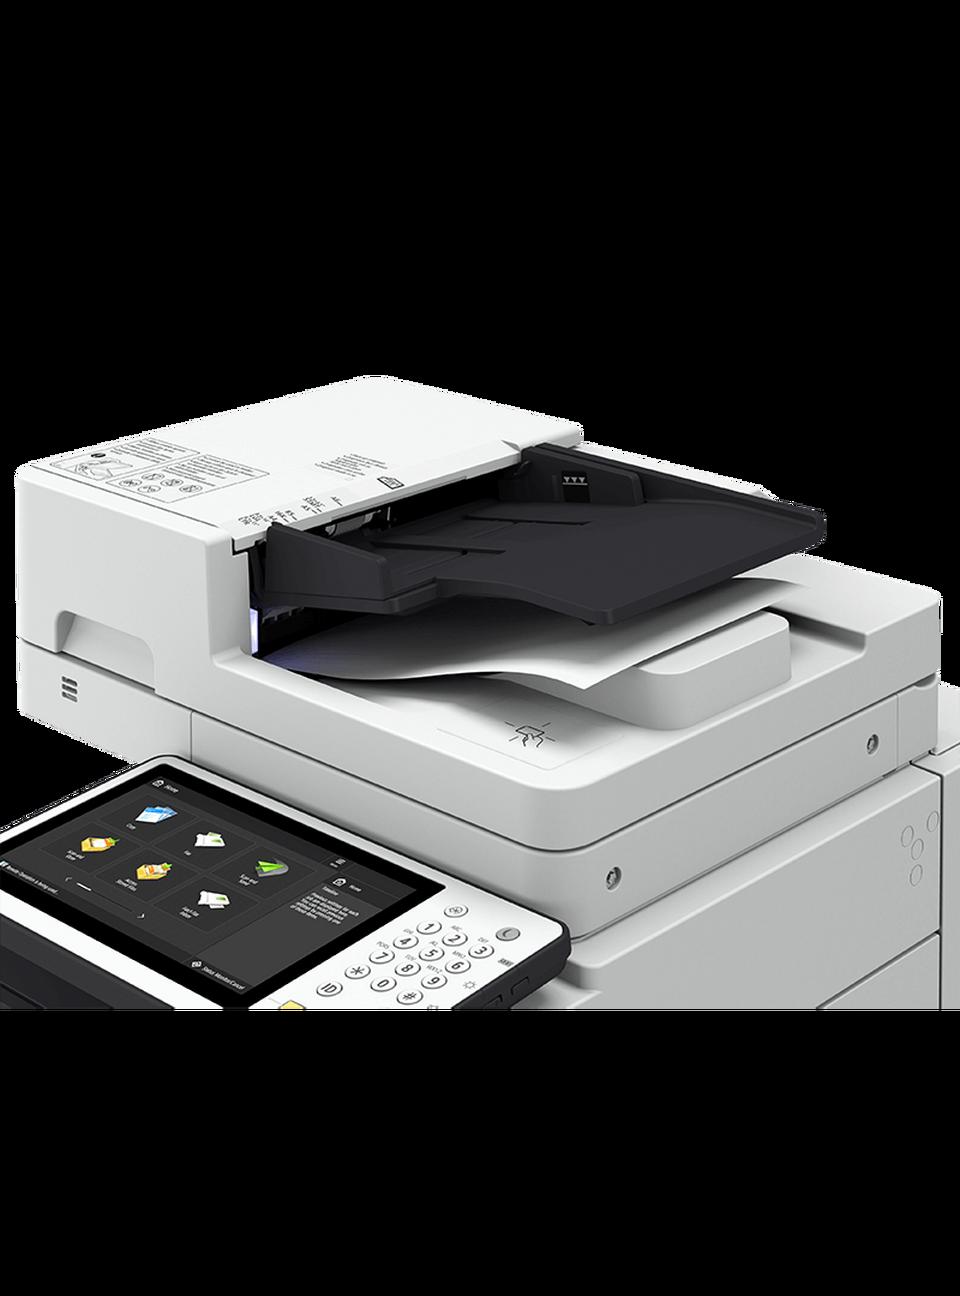 Impresora c475i